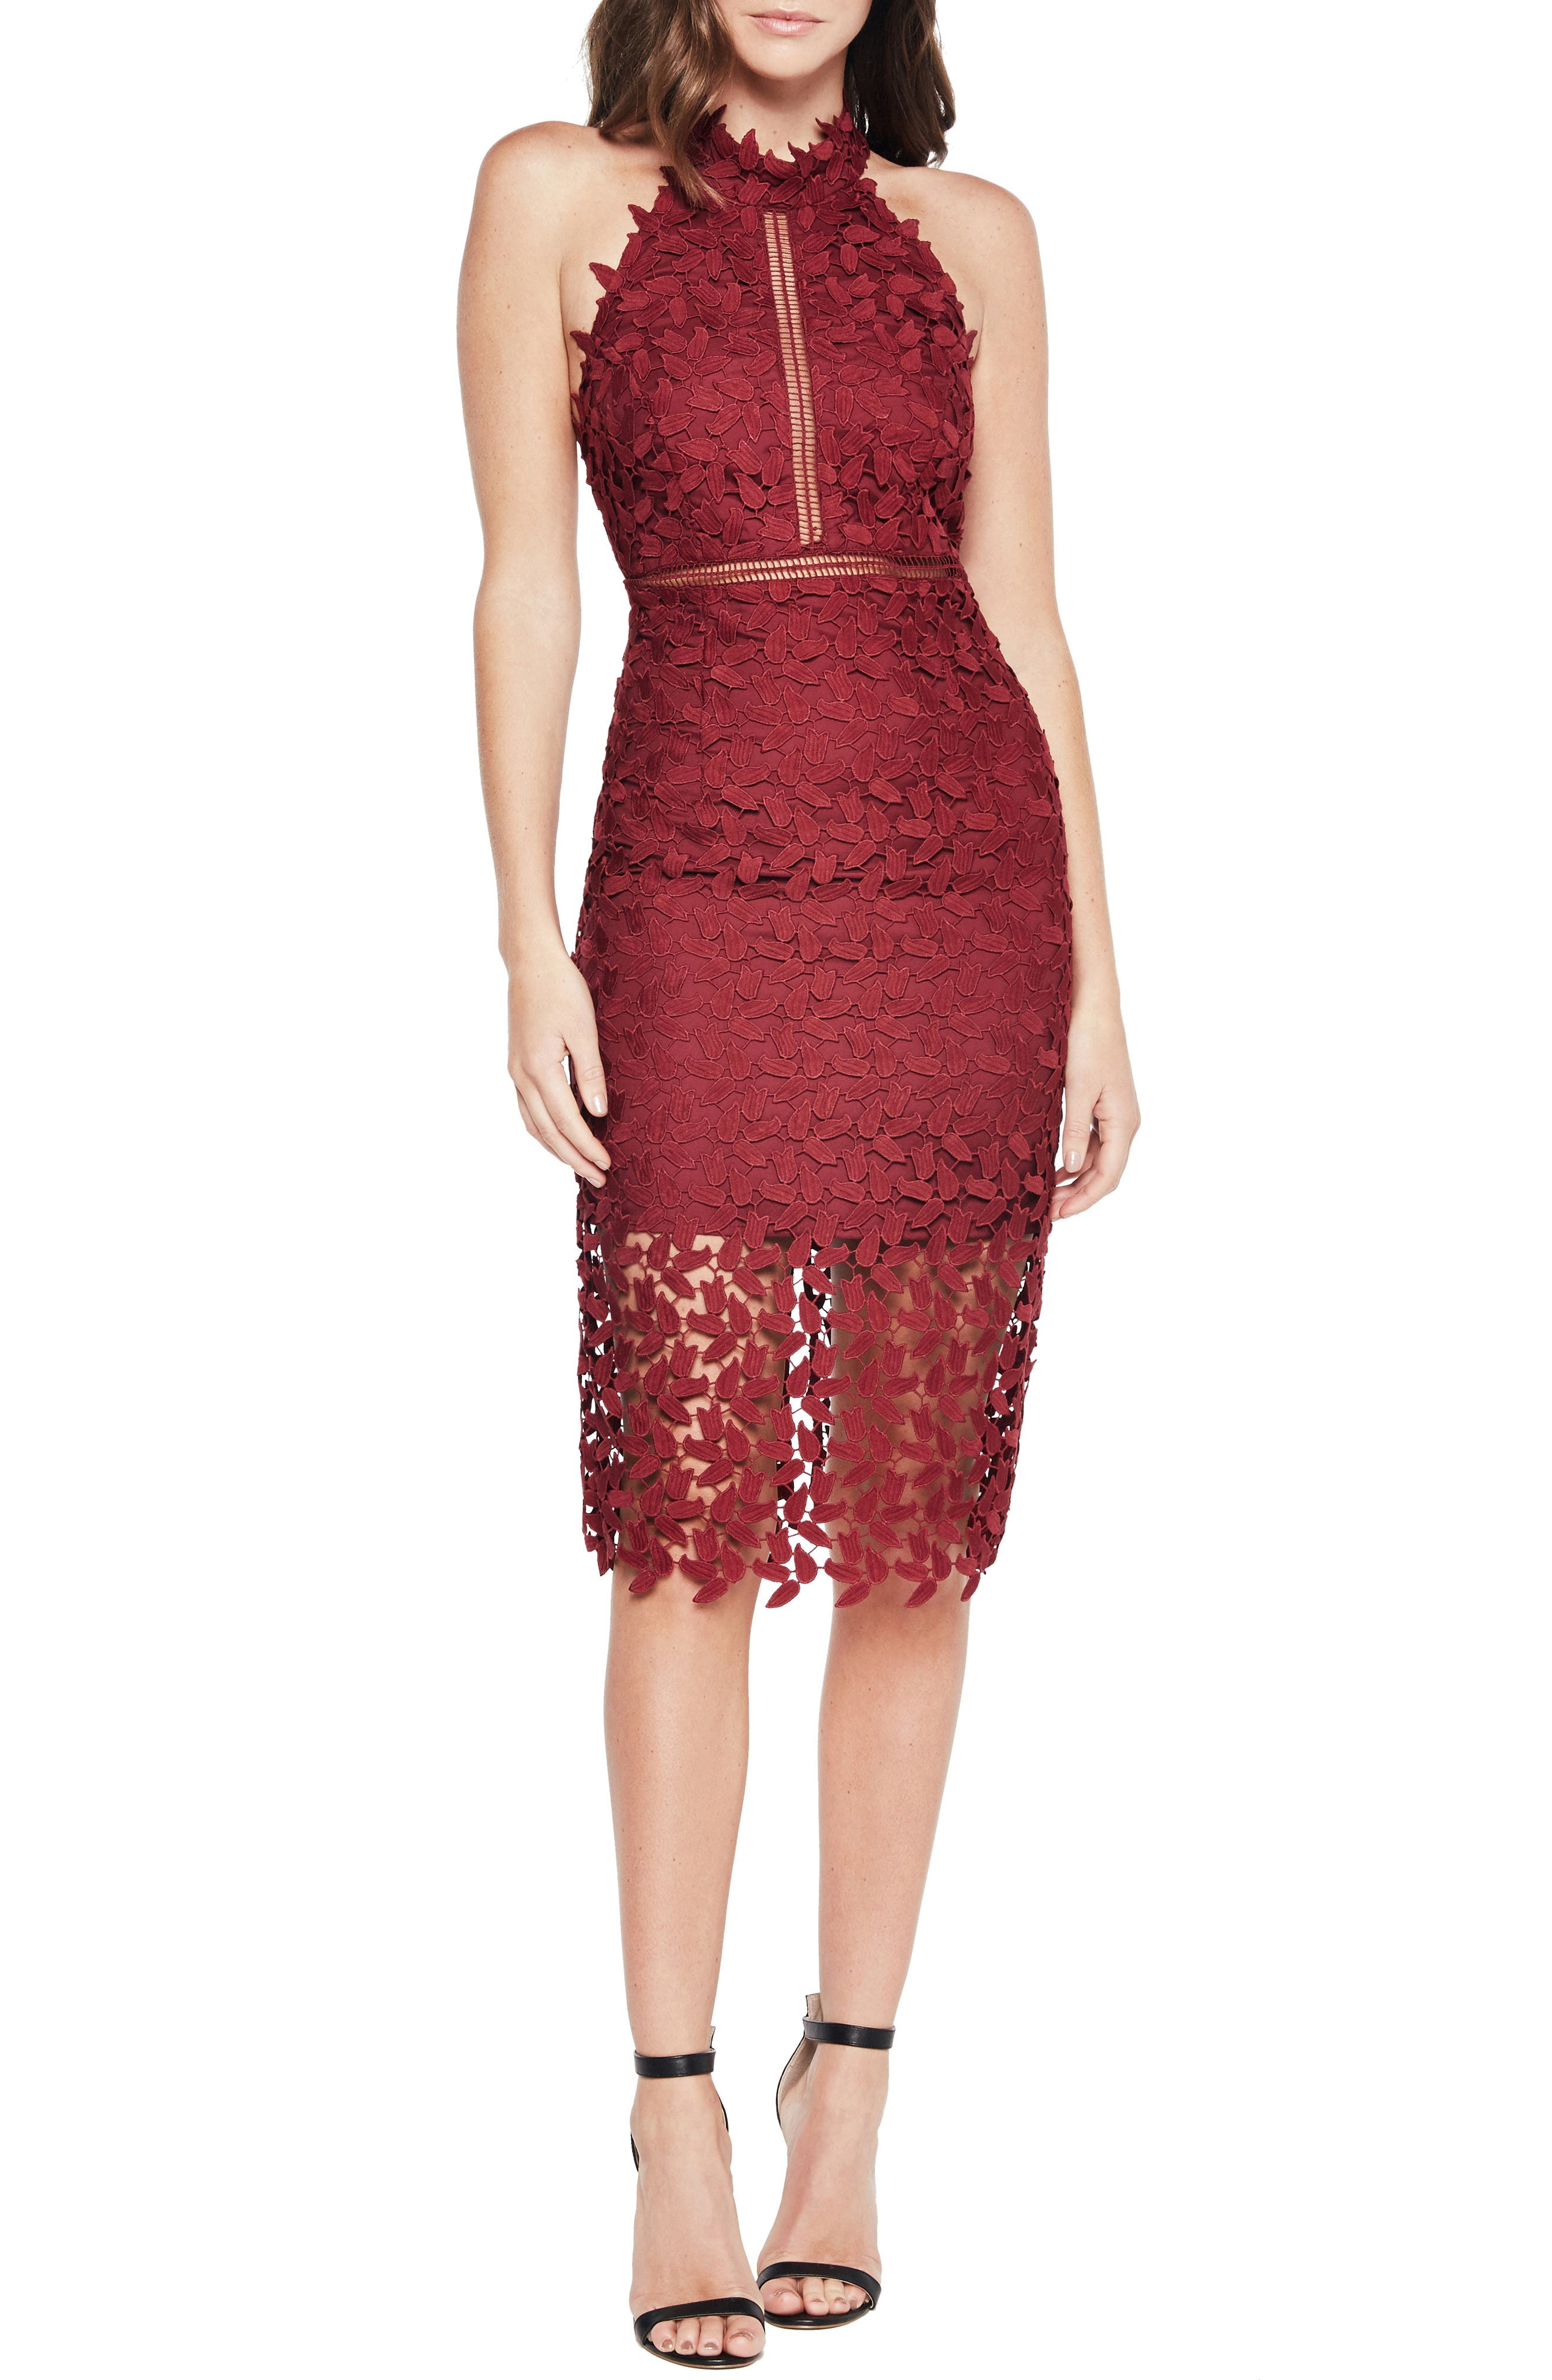 BARDOT, Gemma Halter Lace Sheath Dress, Main thumbnail 1, color, BURGUNDY